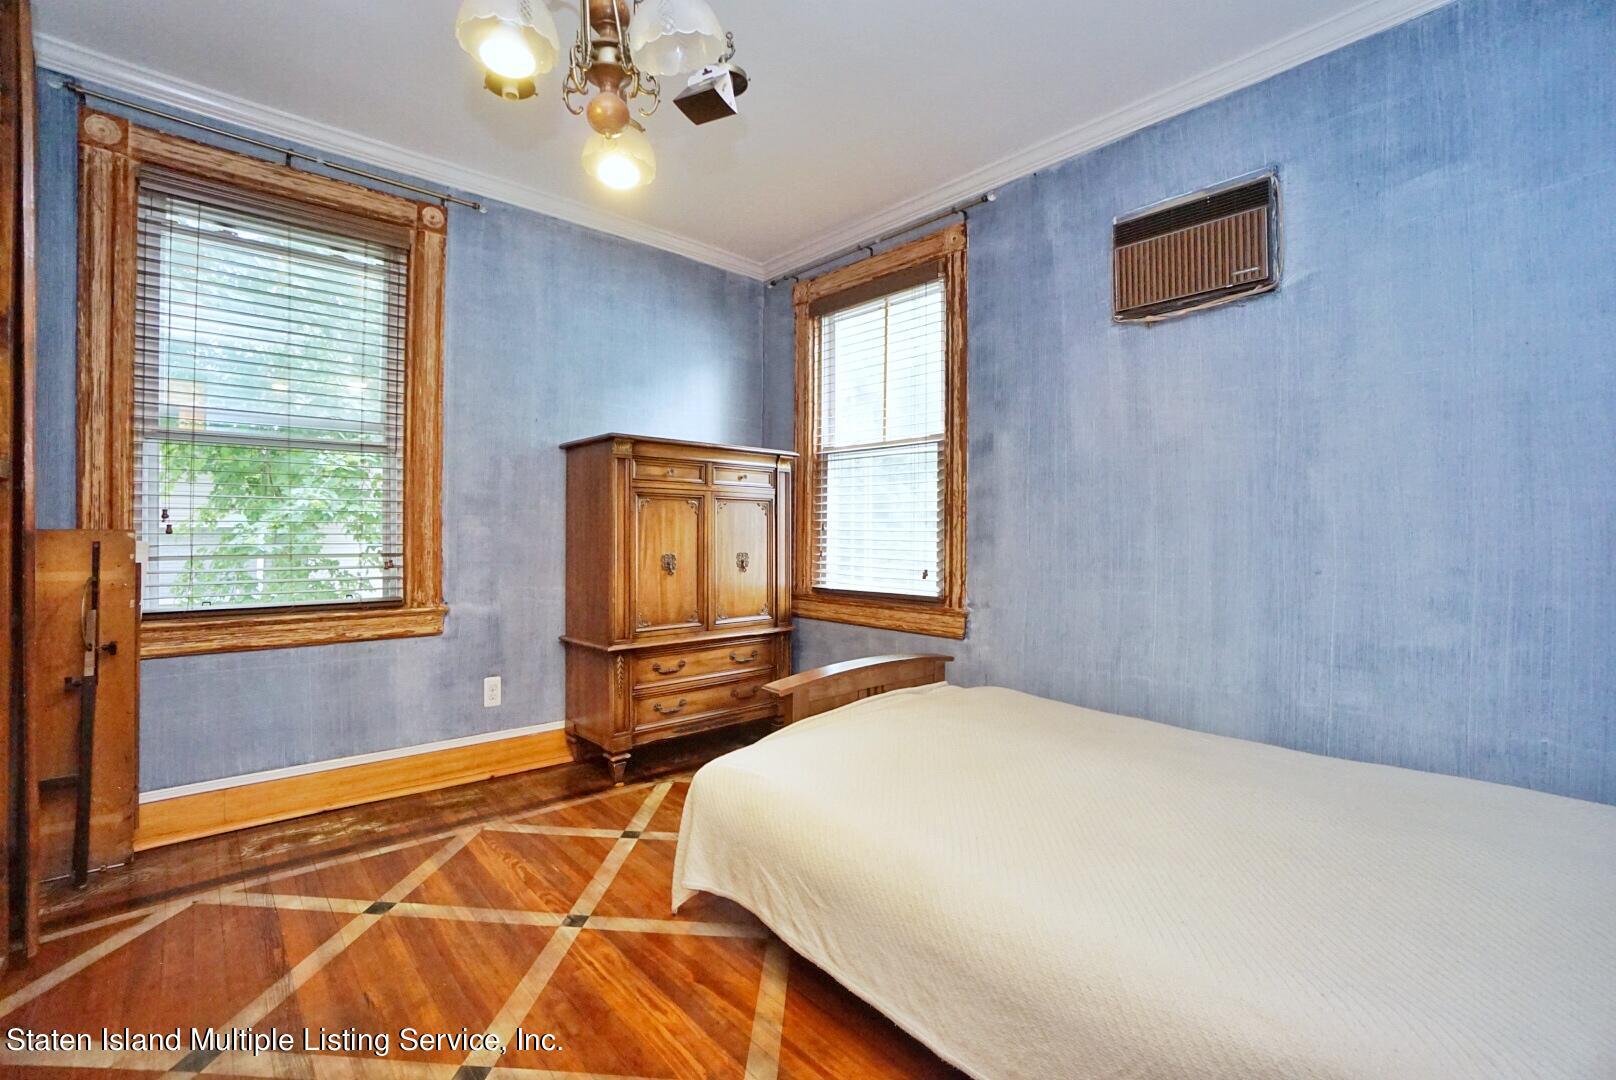 Single Family - Detached 136 York Avenue  Staten Island, NY 10301, MLS-1147575-35